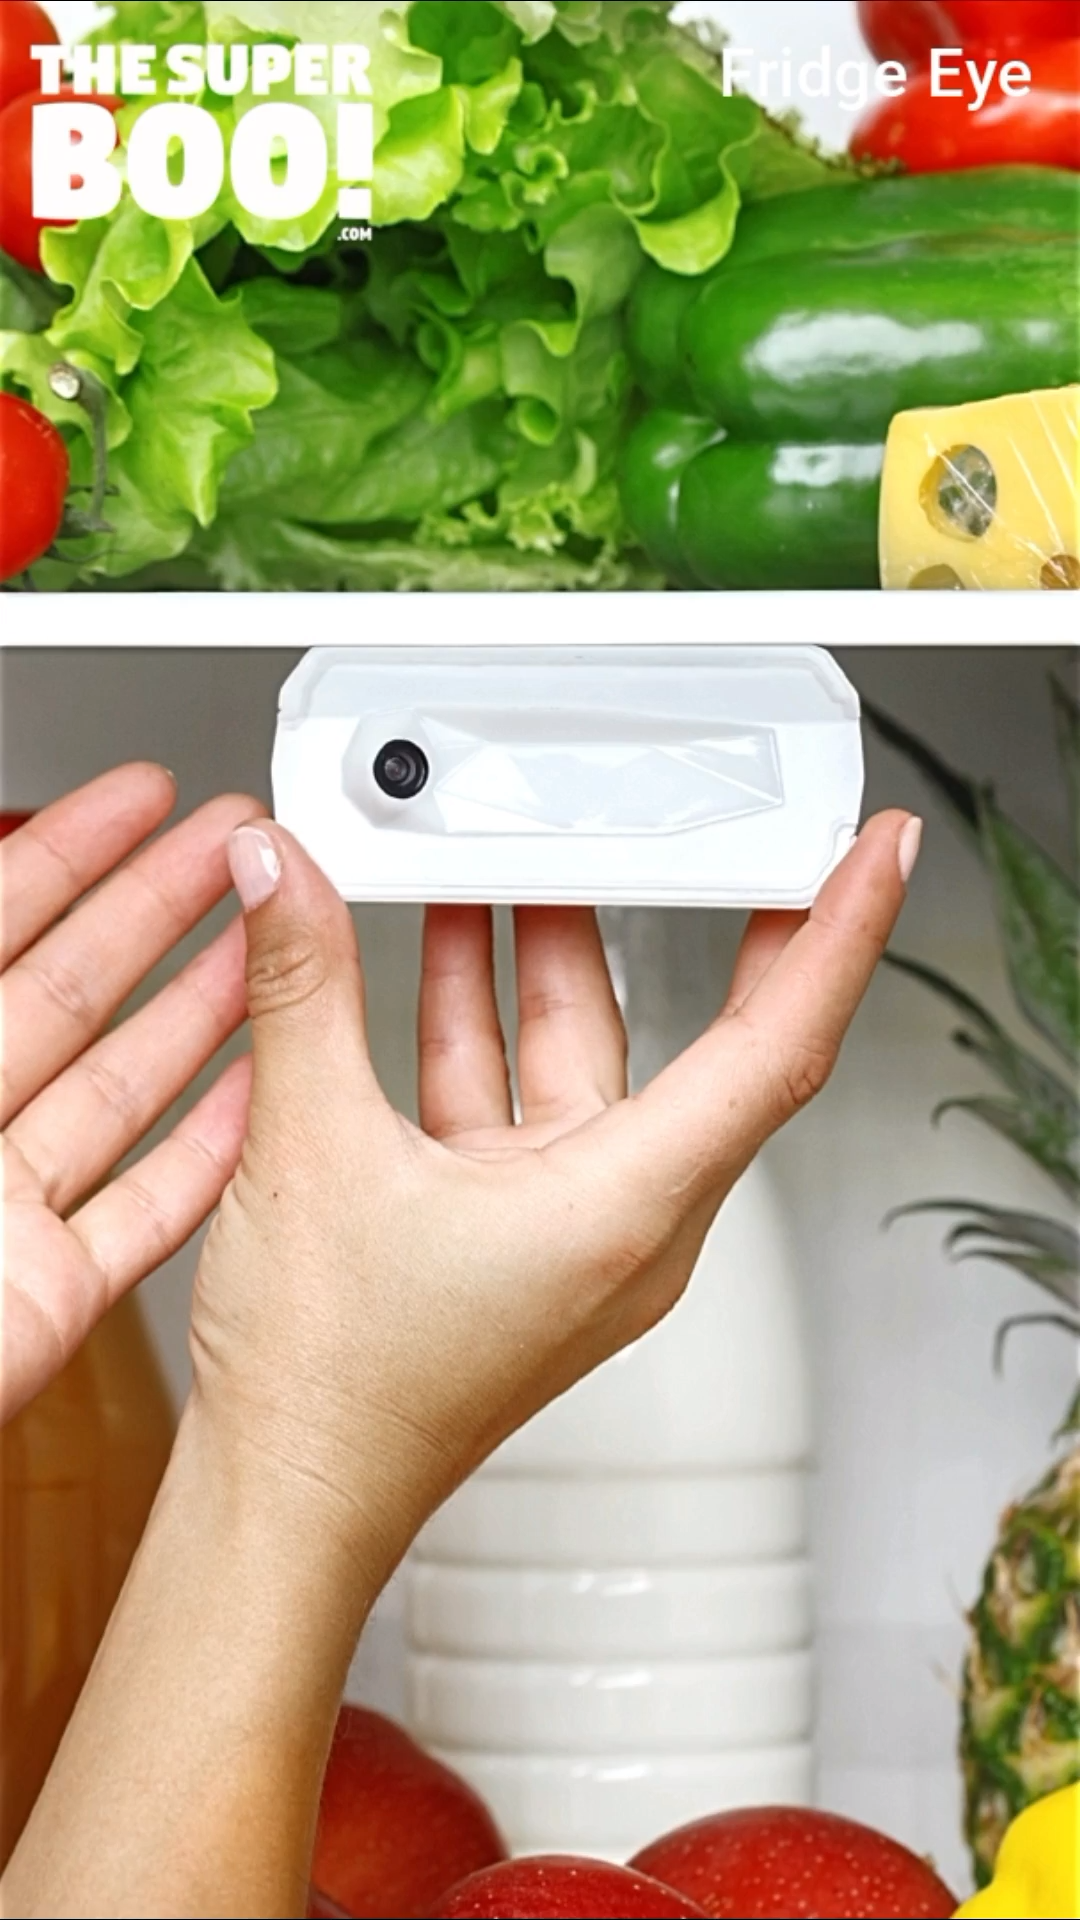 Smart Refrigerator Camera